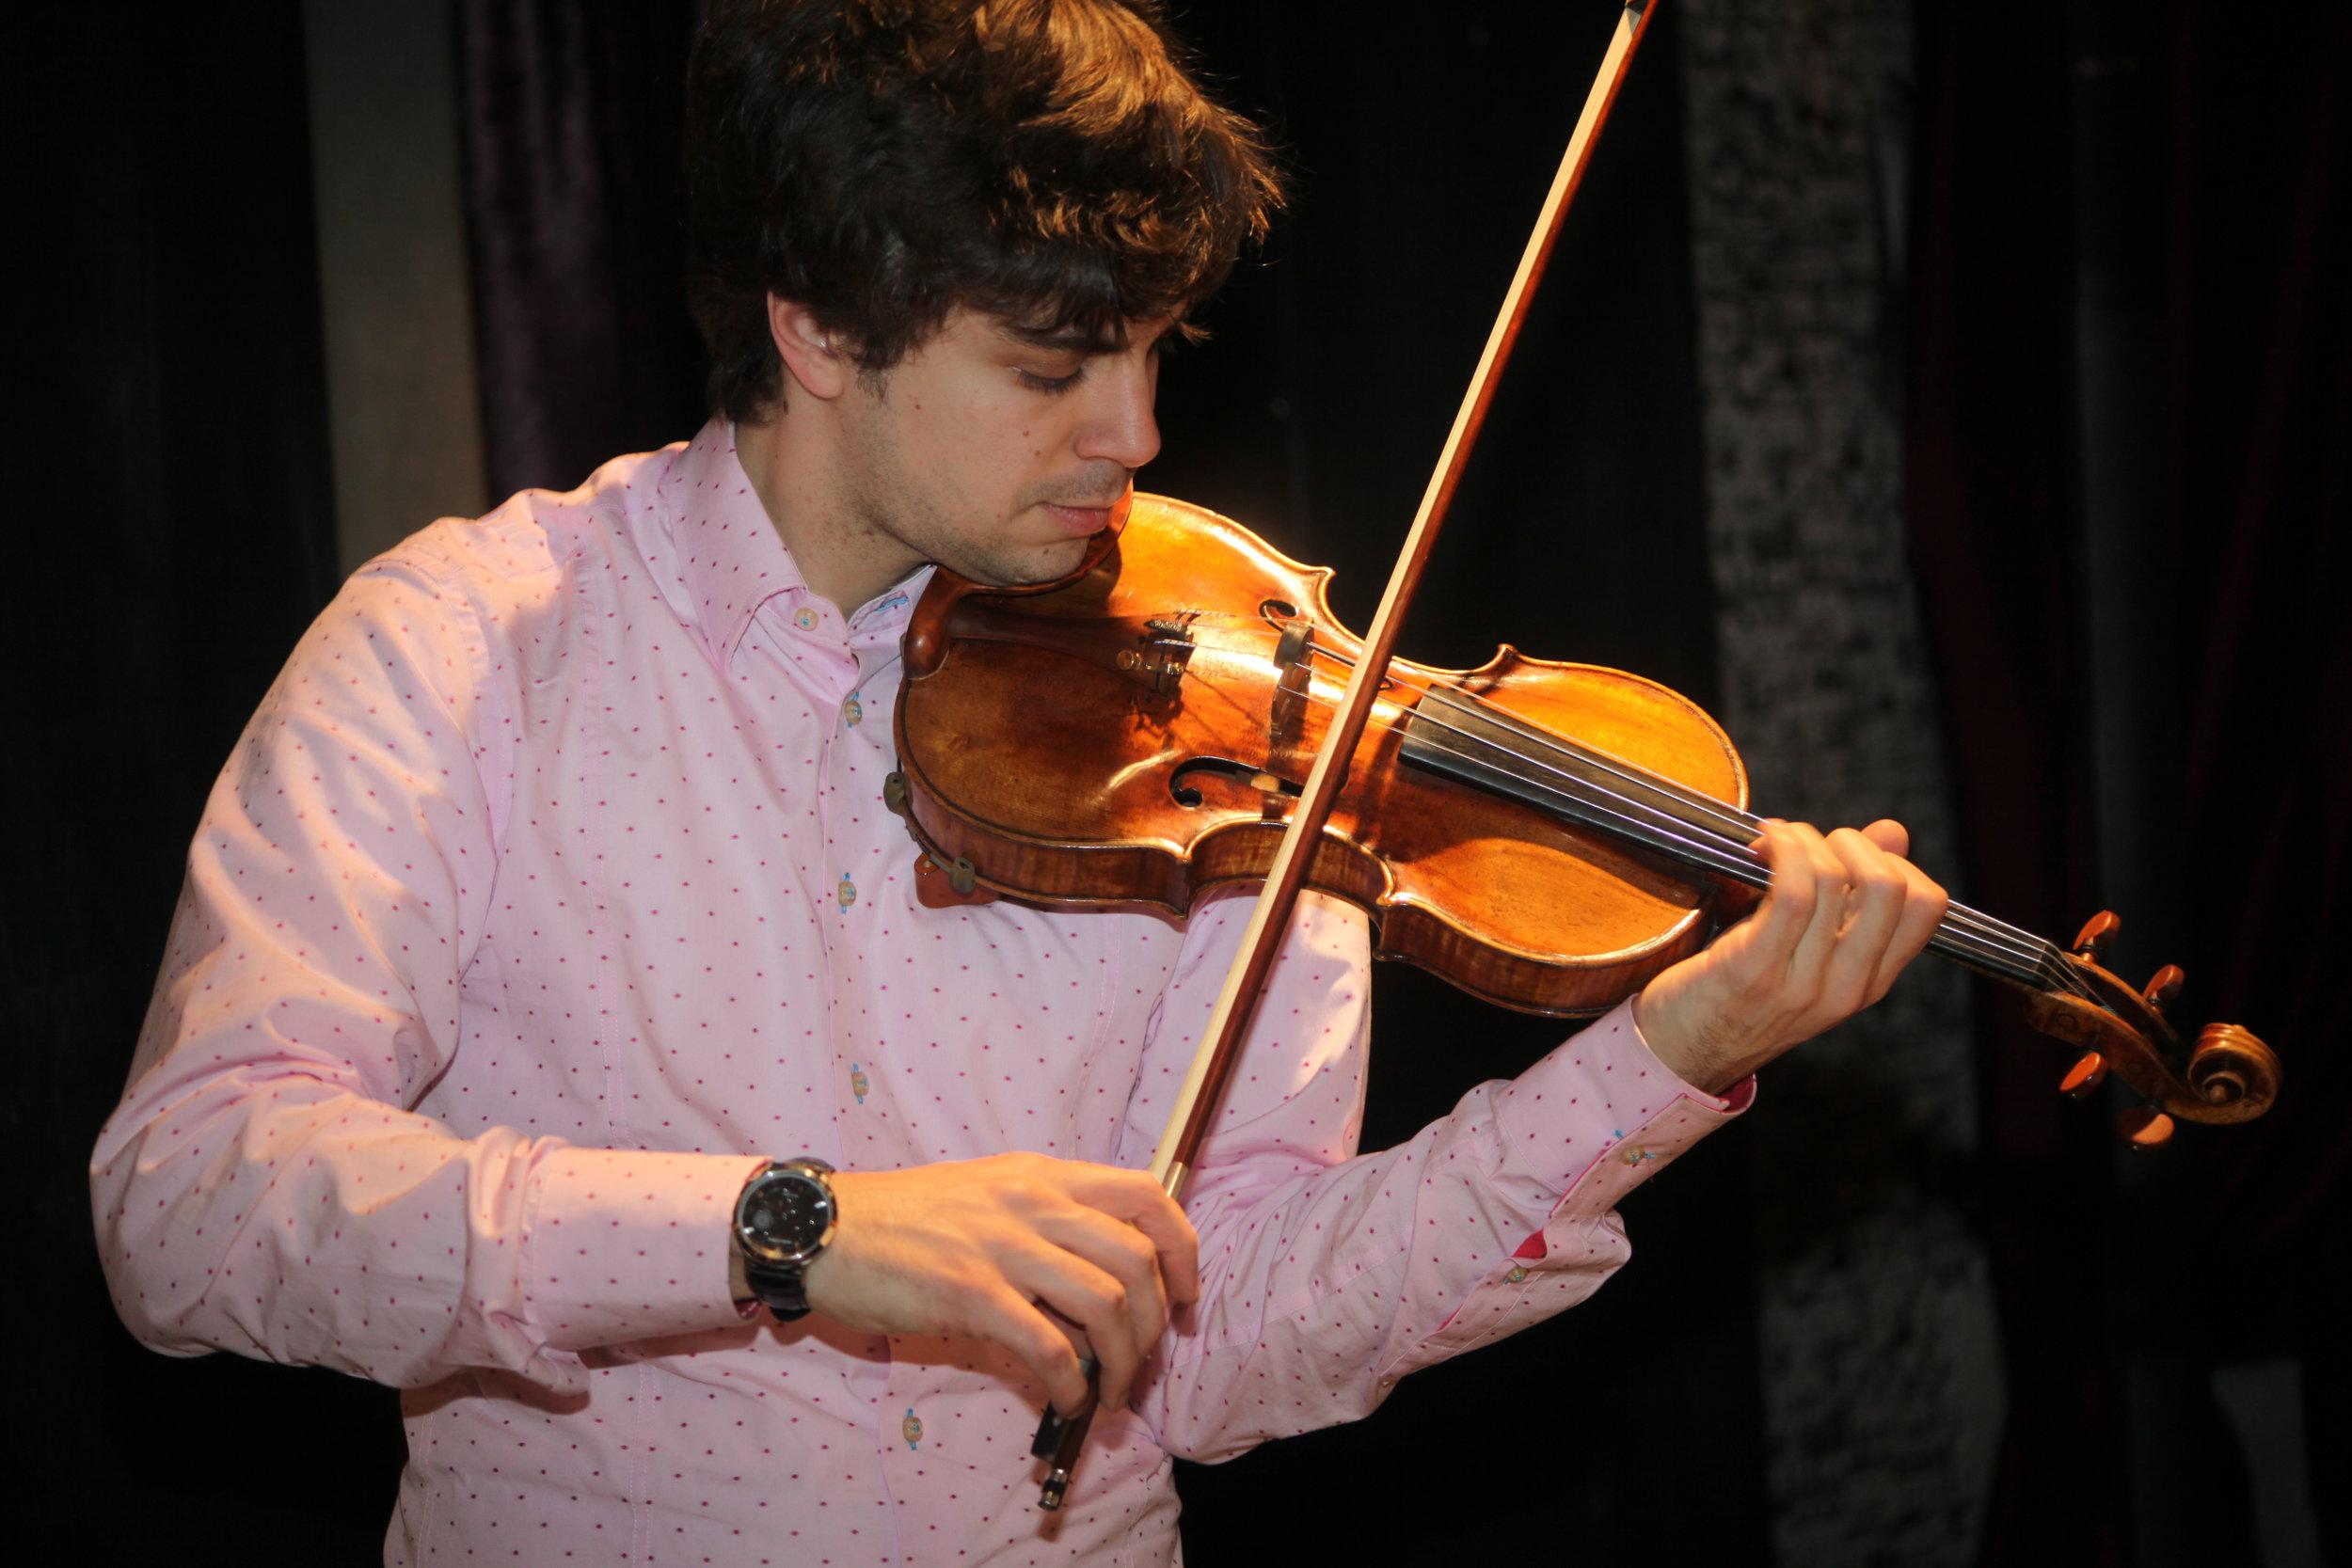 Ambroise_Playing_Violin.jpg